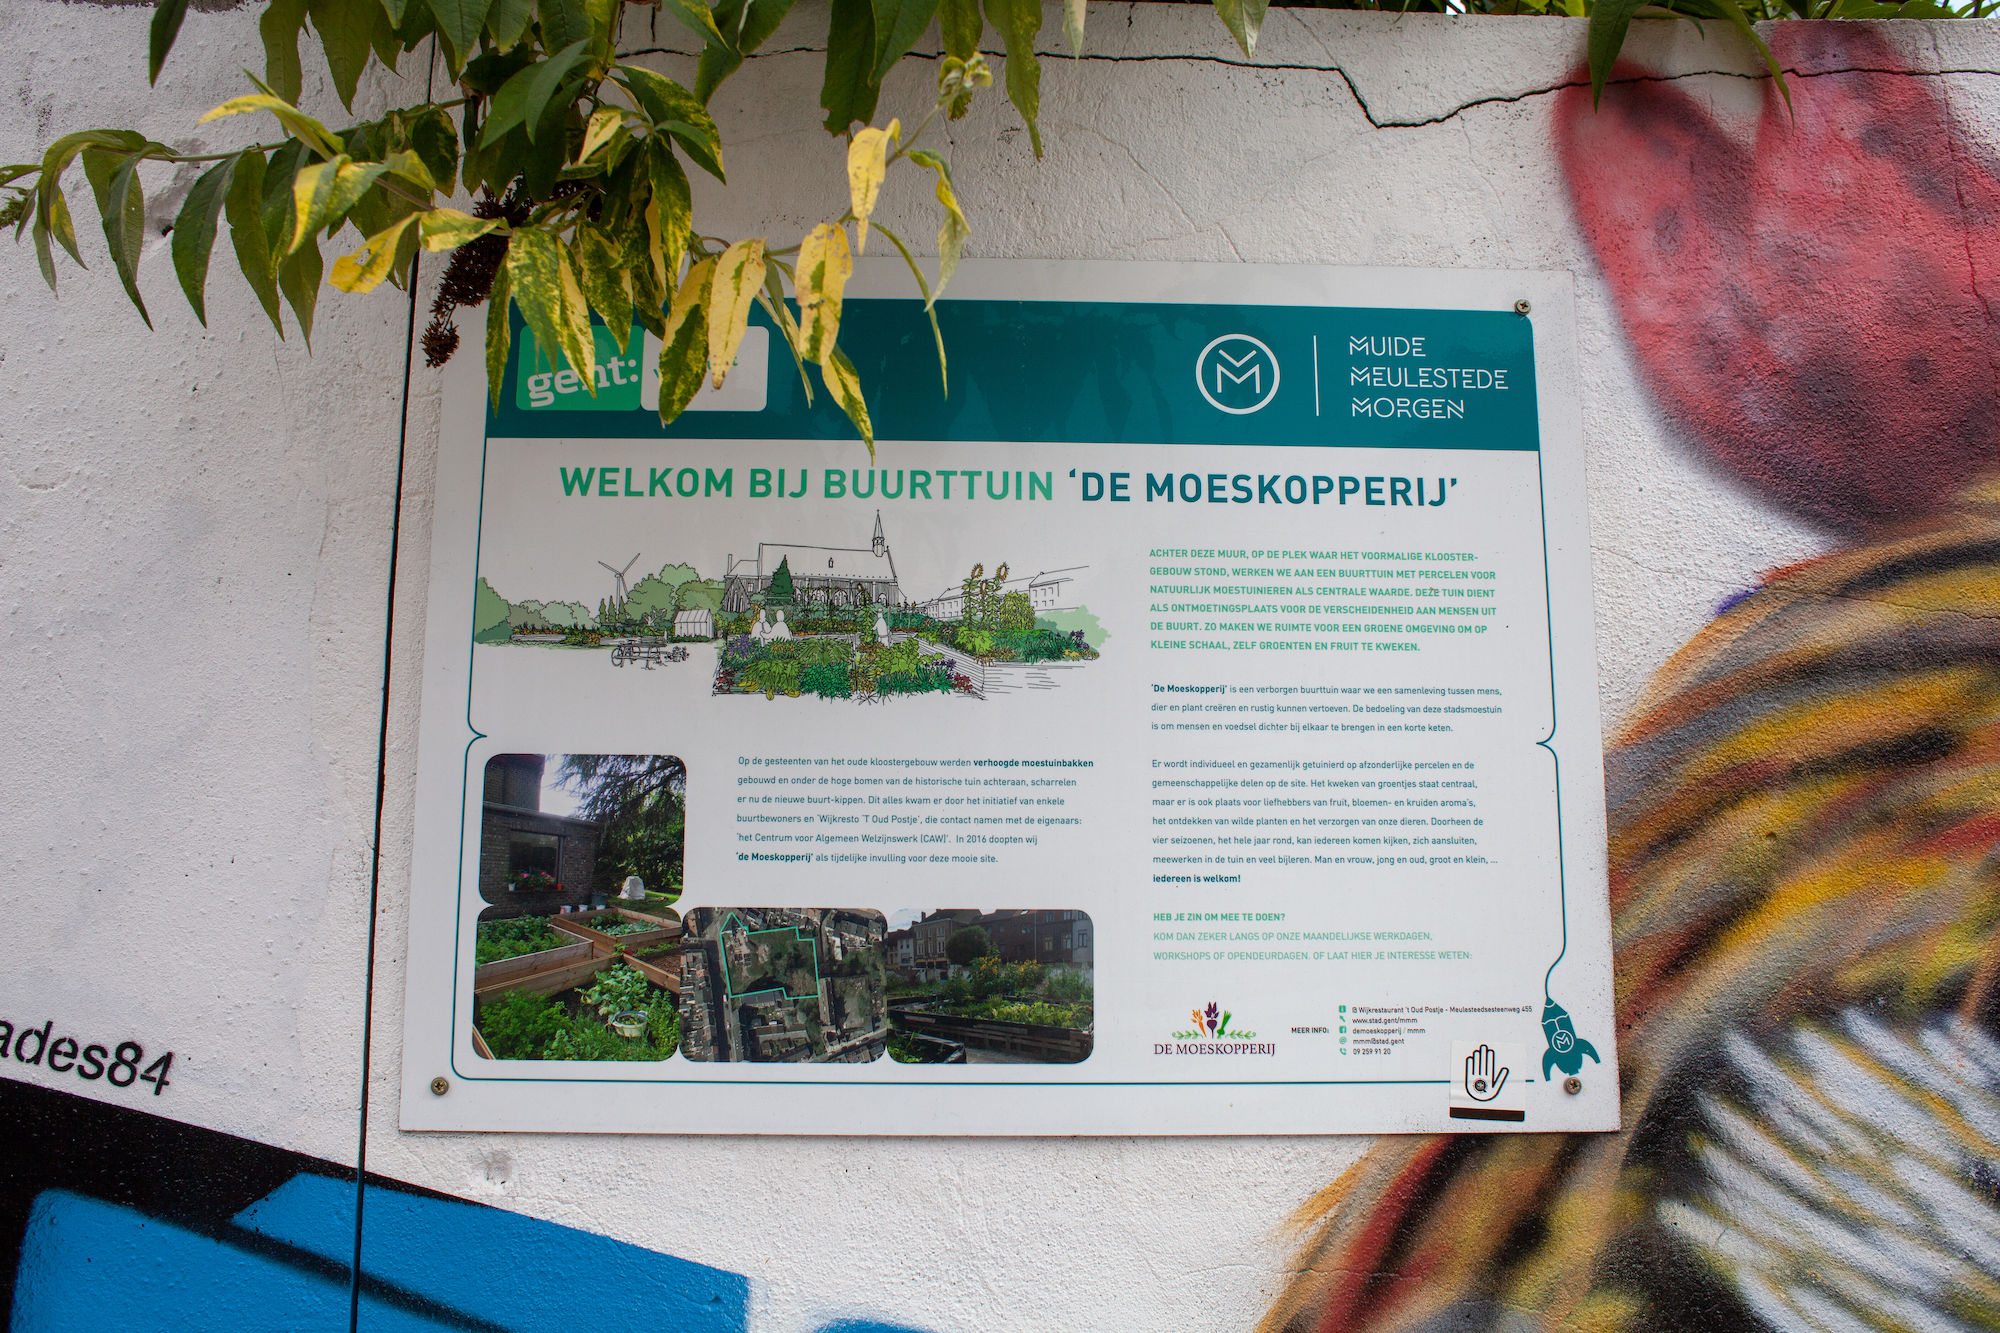 2019-07-02 Muide Meulestede prospectie Wannes_stadsvernieuwing_IMG_0308-3.jpg